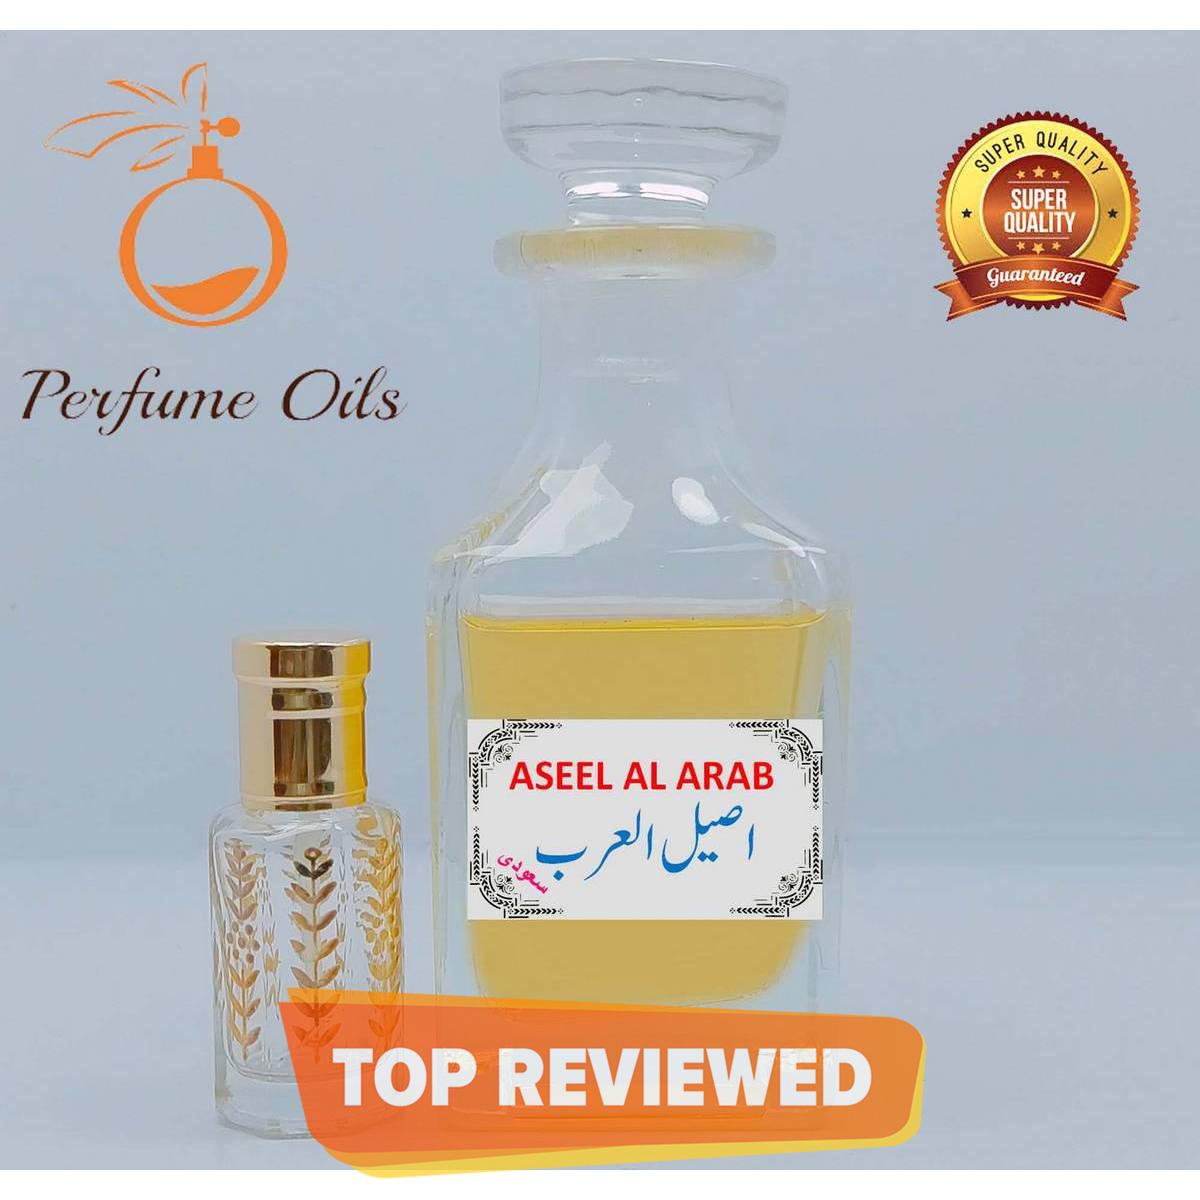 ASEEL AL ARAB SURRATI__Special Perfume Oil Attar / Ittar  Best Projection  Long Lasting High Quality Original Fragrance by Perfume Oils Store